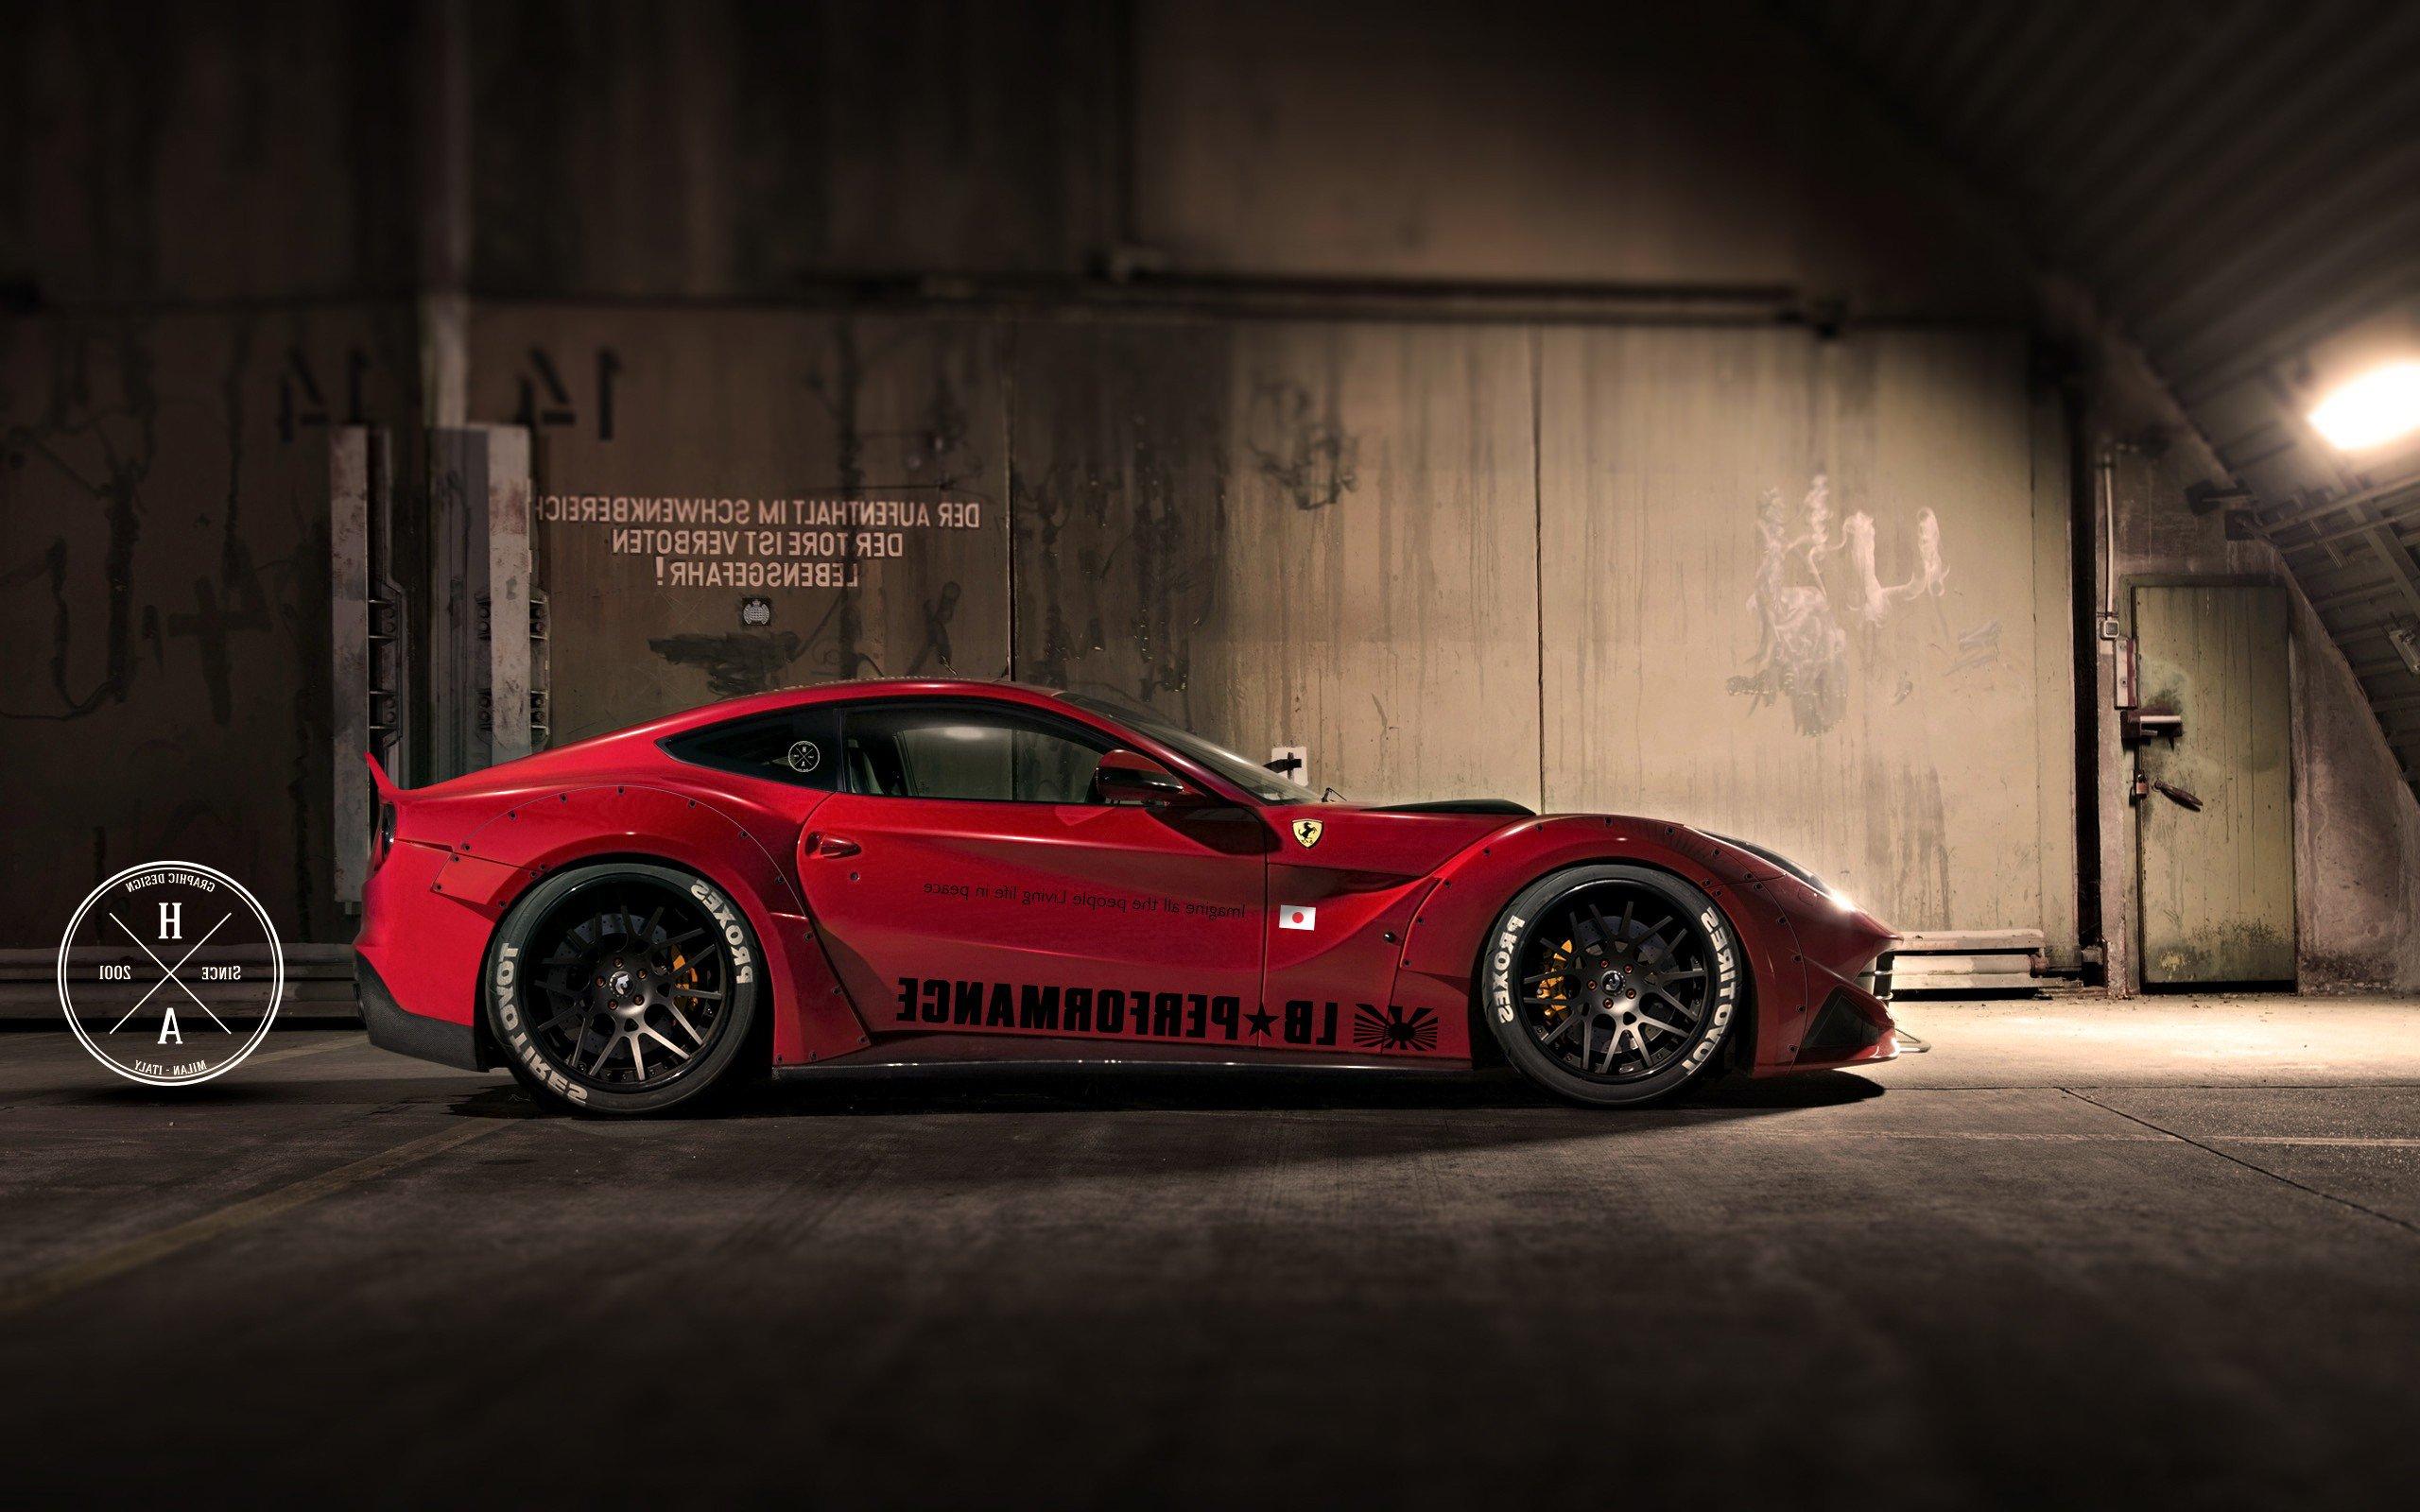 Ferrari 458 Italia HD Cars 4k Wallpapers Images